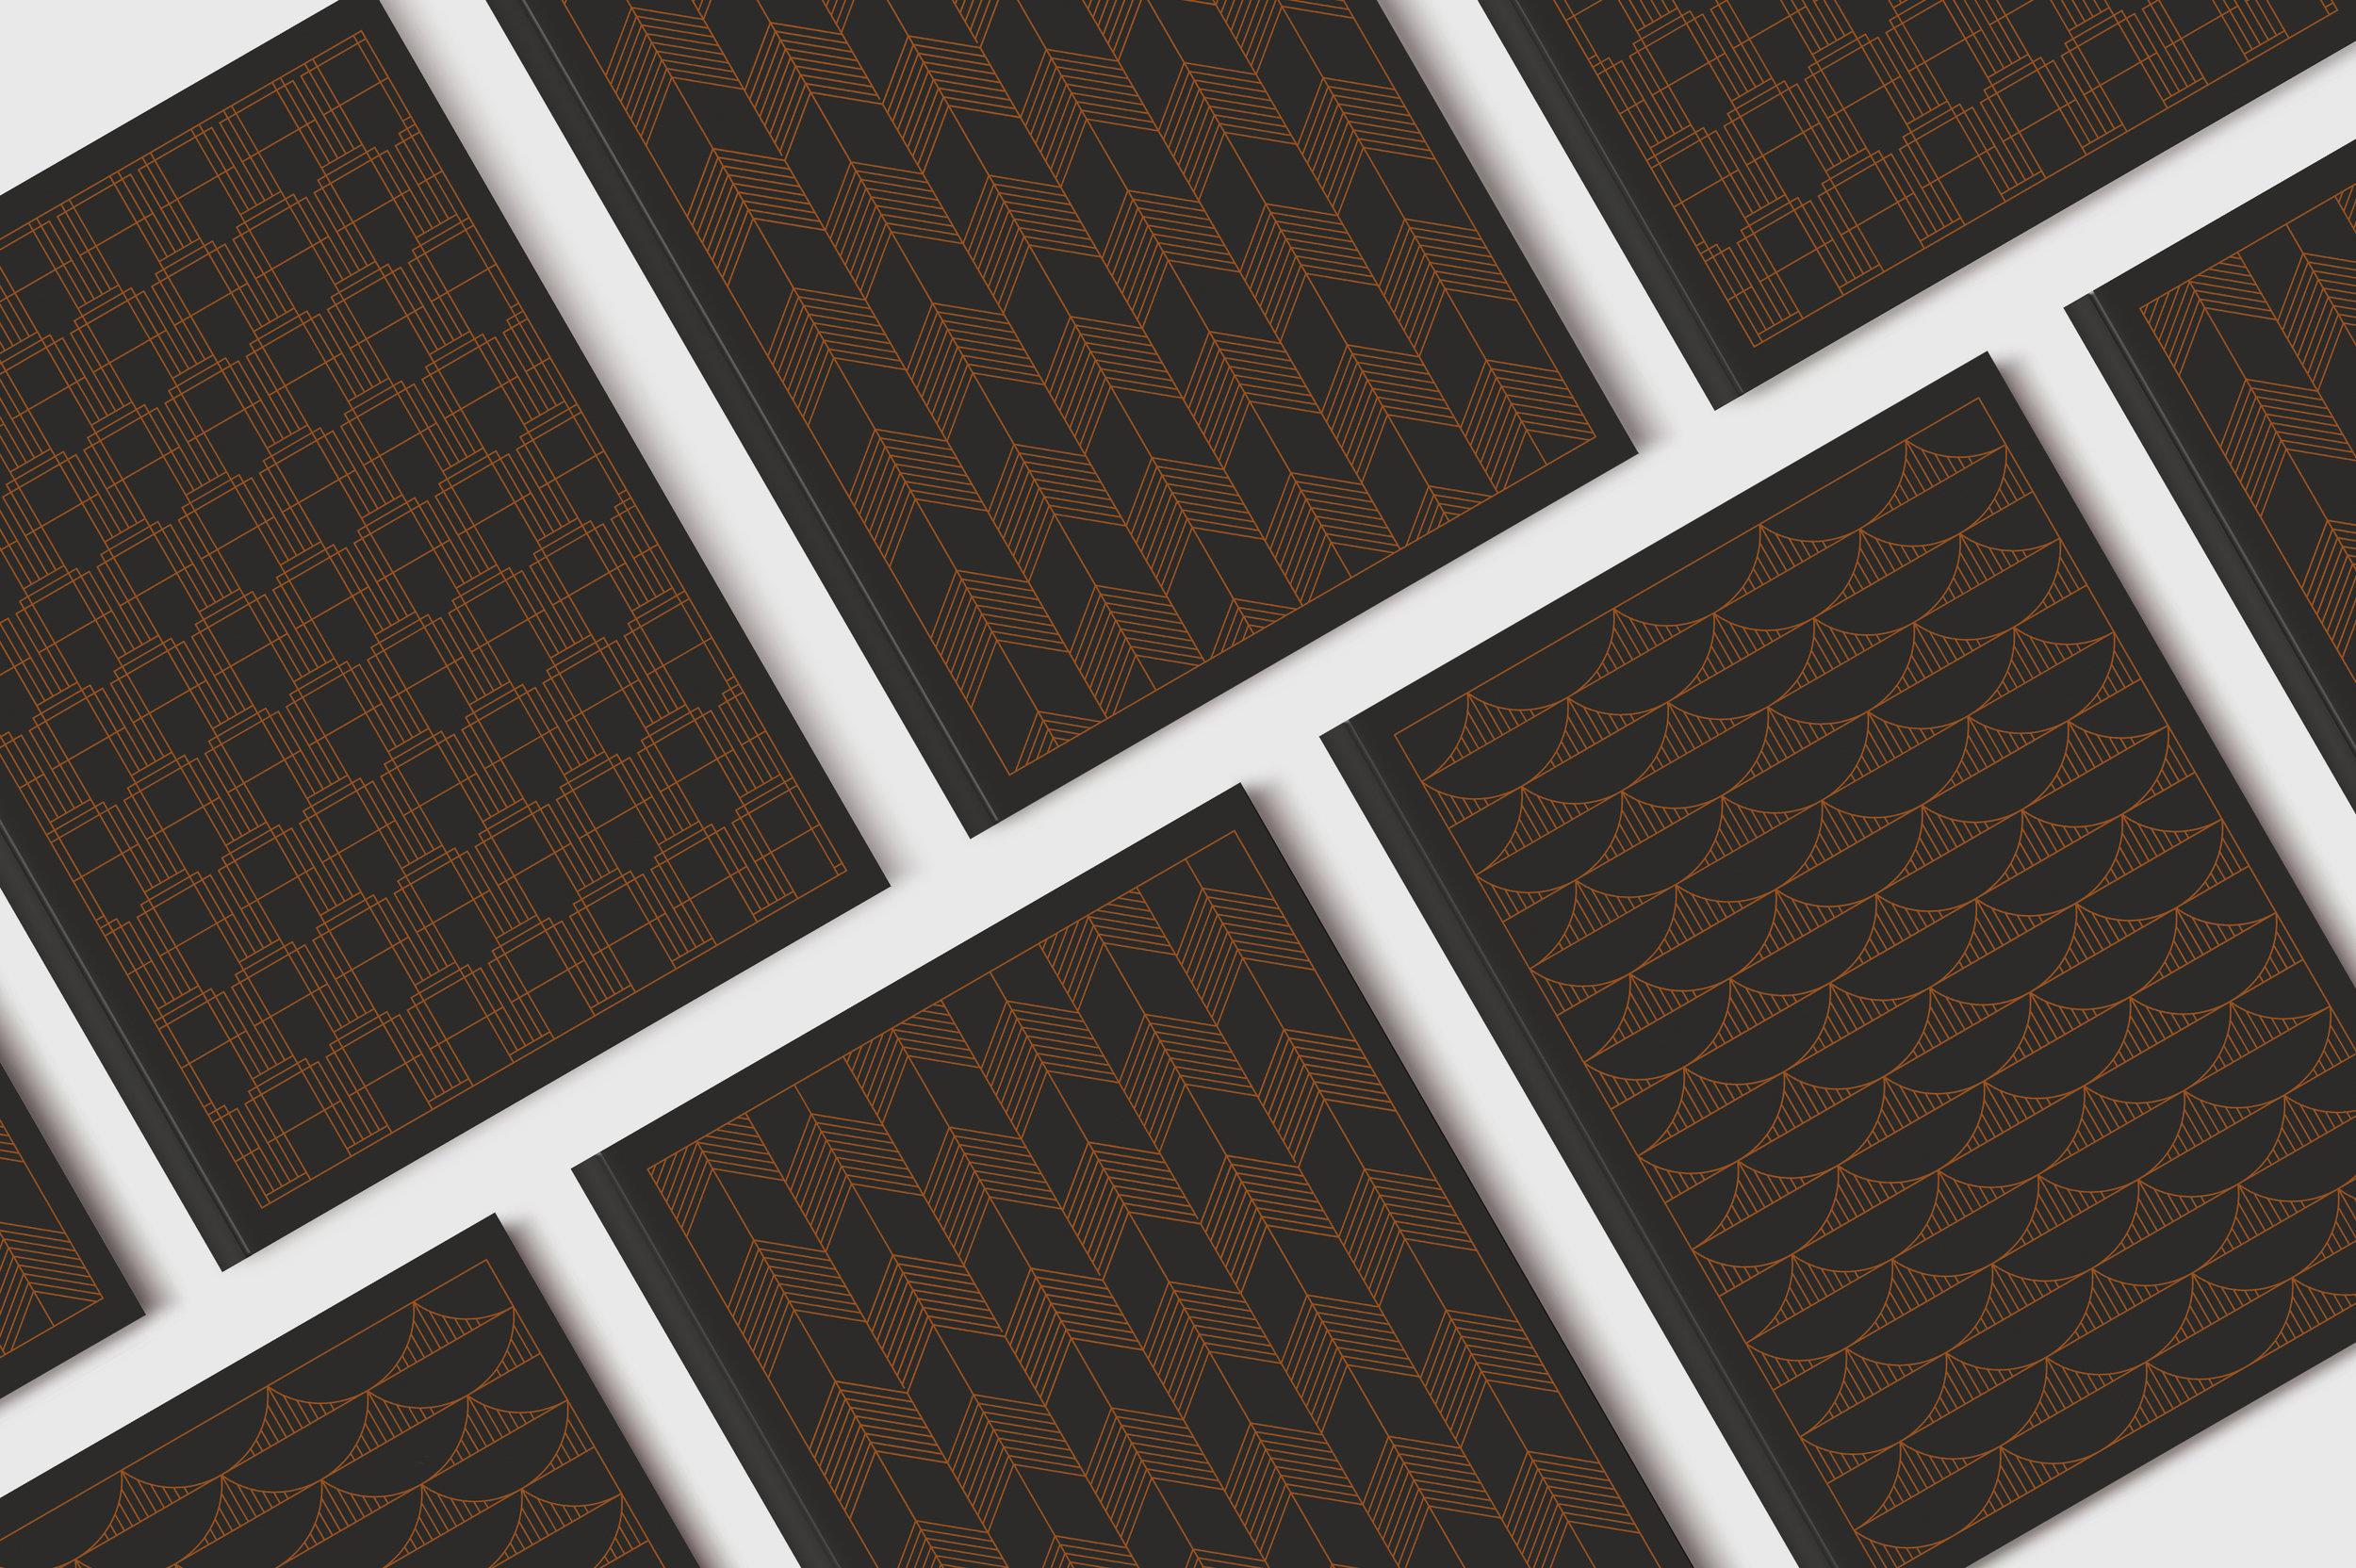 TheAlexandira_Patterns_Cover.jpg